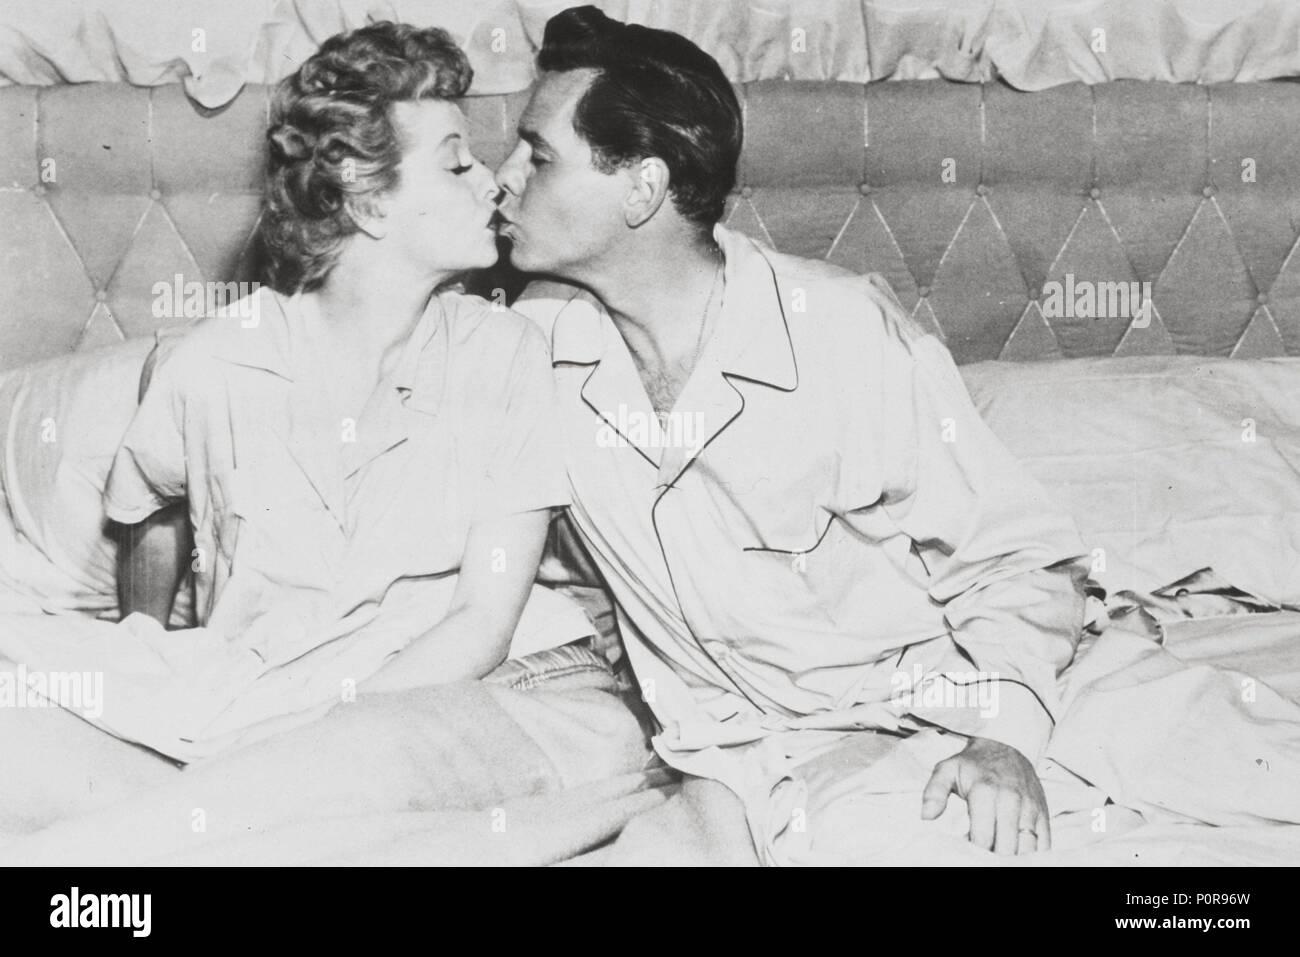 094ac05f Lucille Ball And Desi Arnaz Stock Photos & Lucille Ball And Desi ...